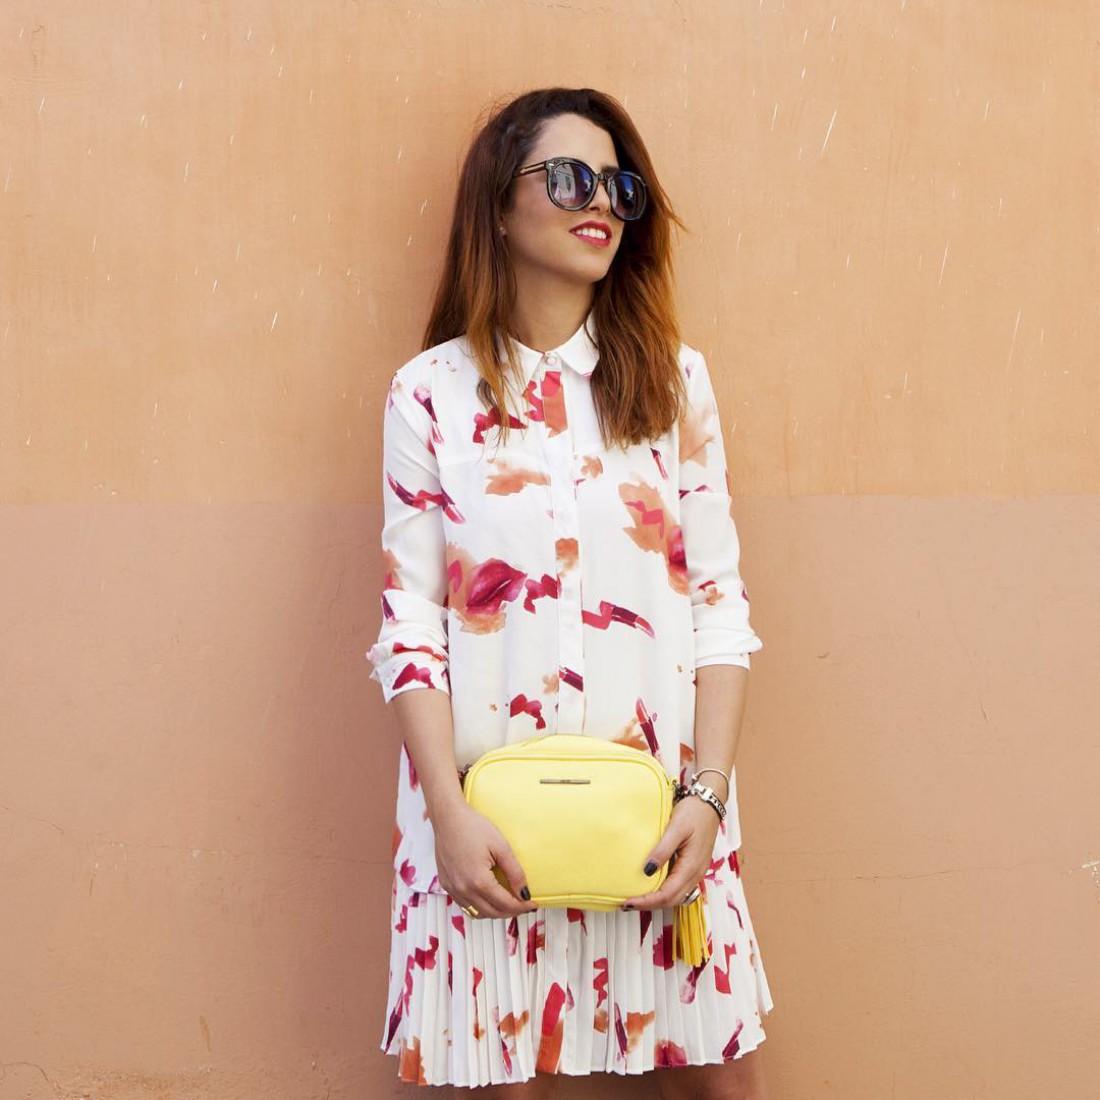 Fashion-блогер из Израиля